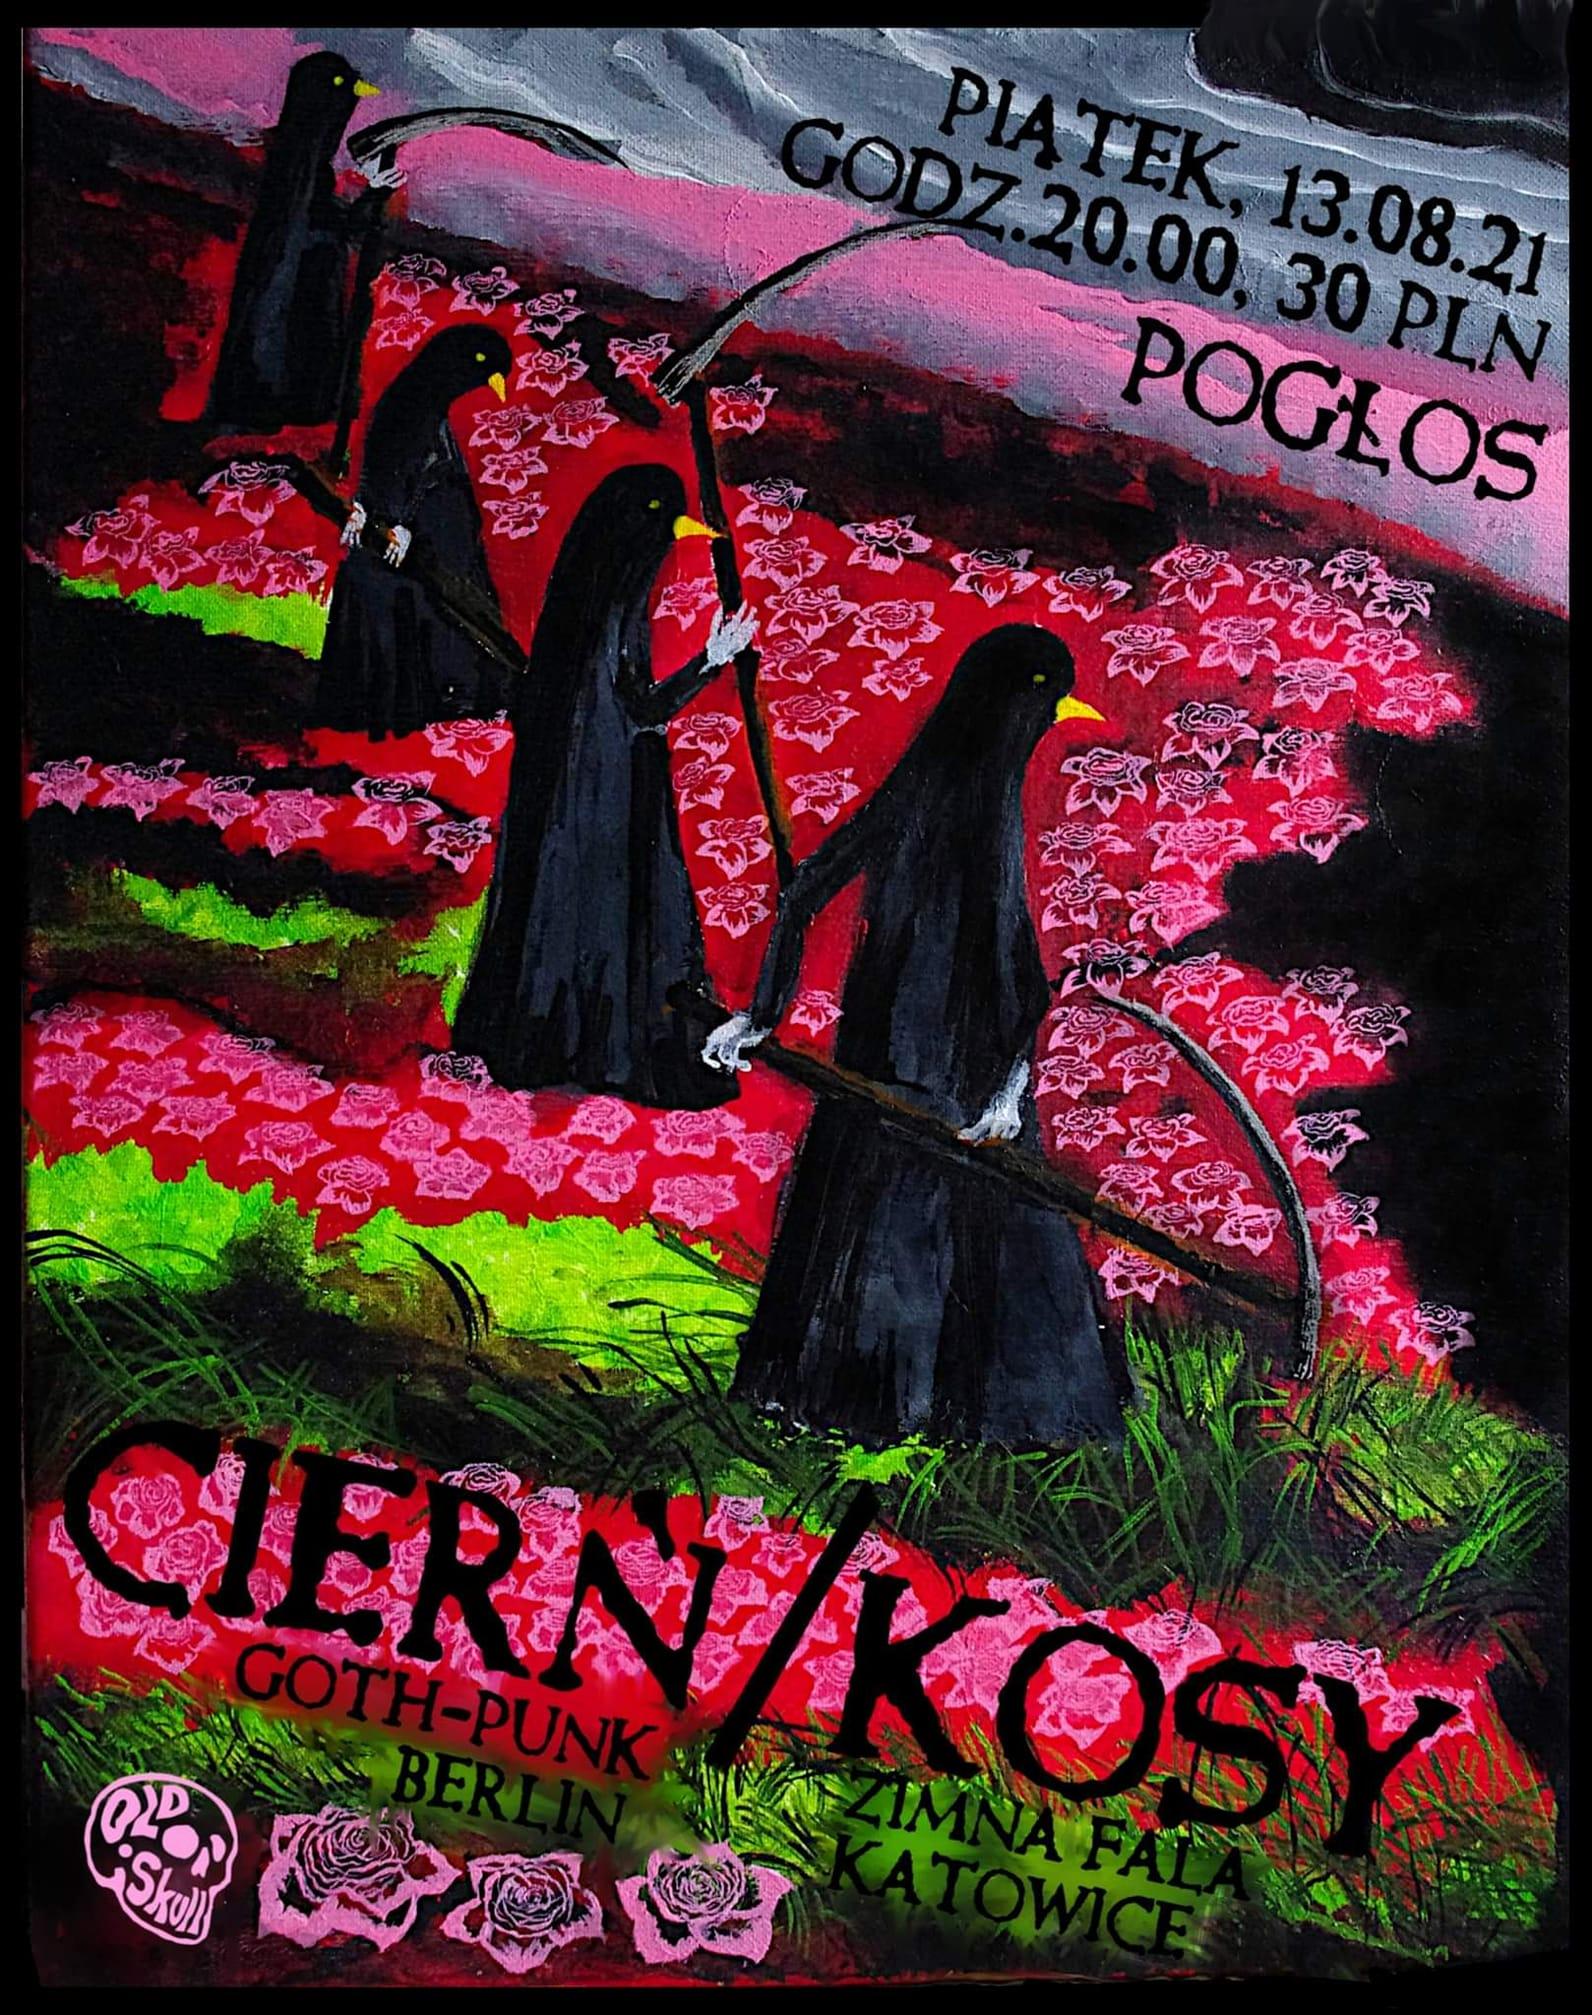 Old Skull - Cierń - Kosy (Pogłos. Warszawa, 13.08.2021)